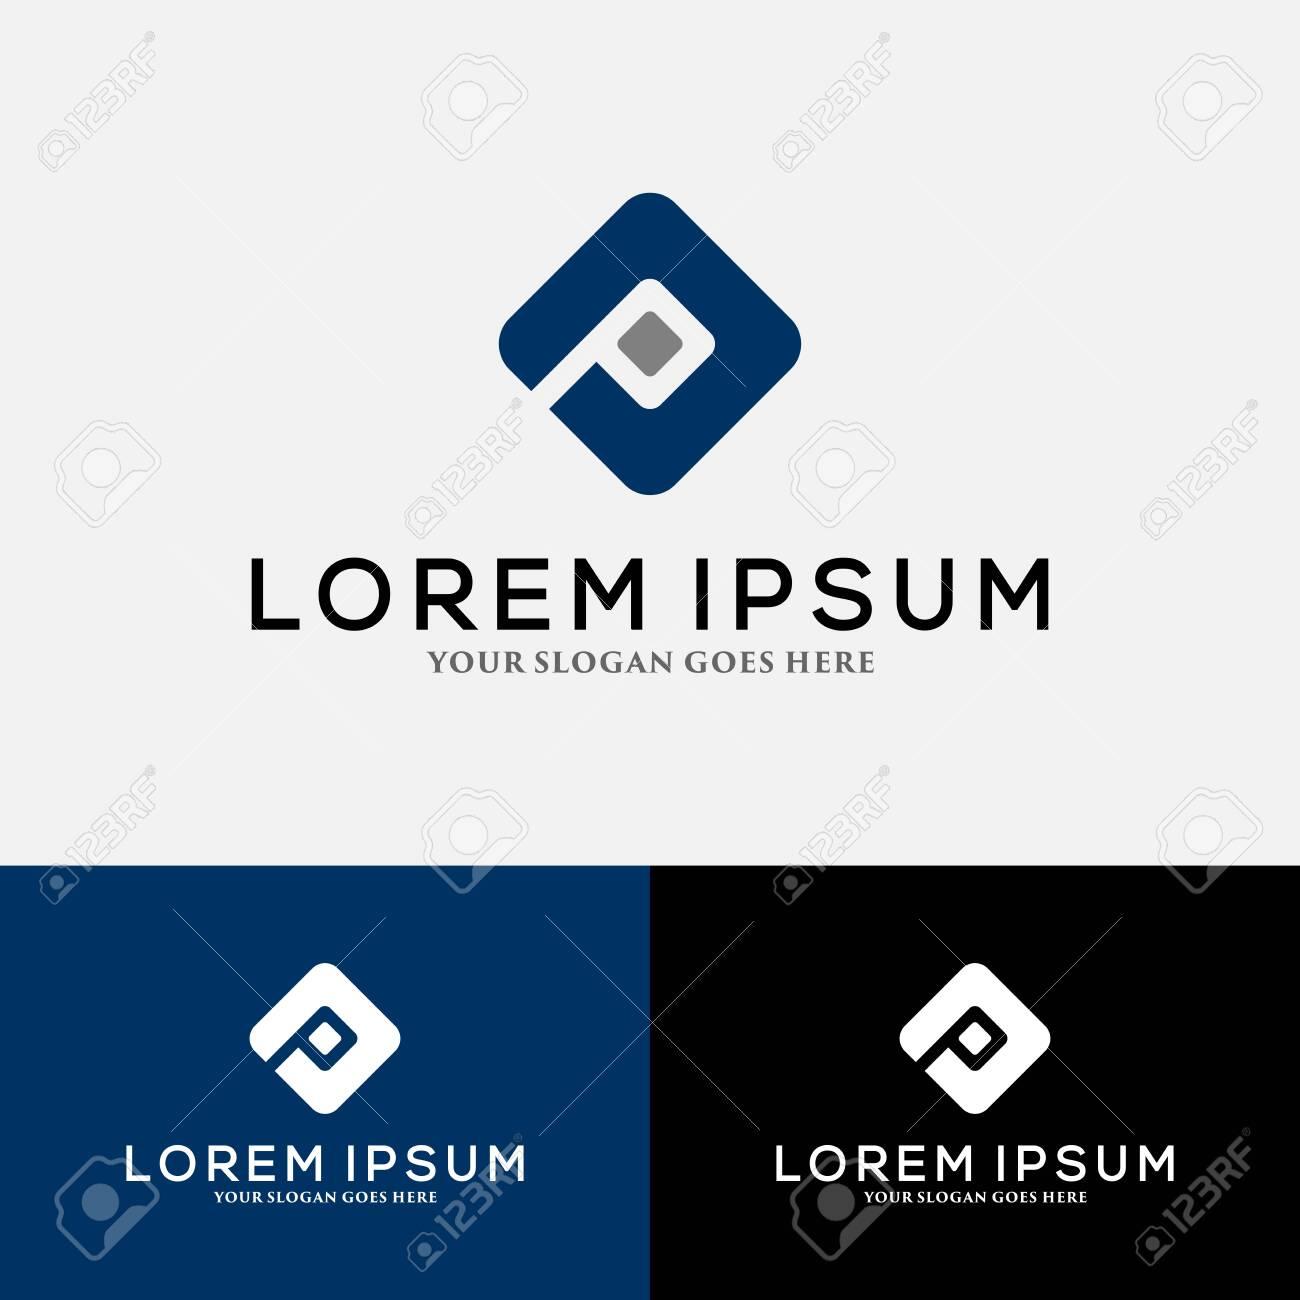 Letter P logo vector, icon design template elements - 149438170